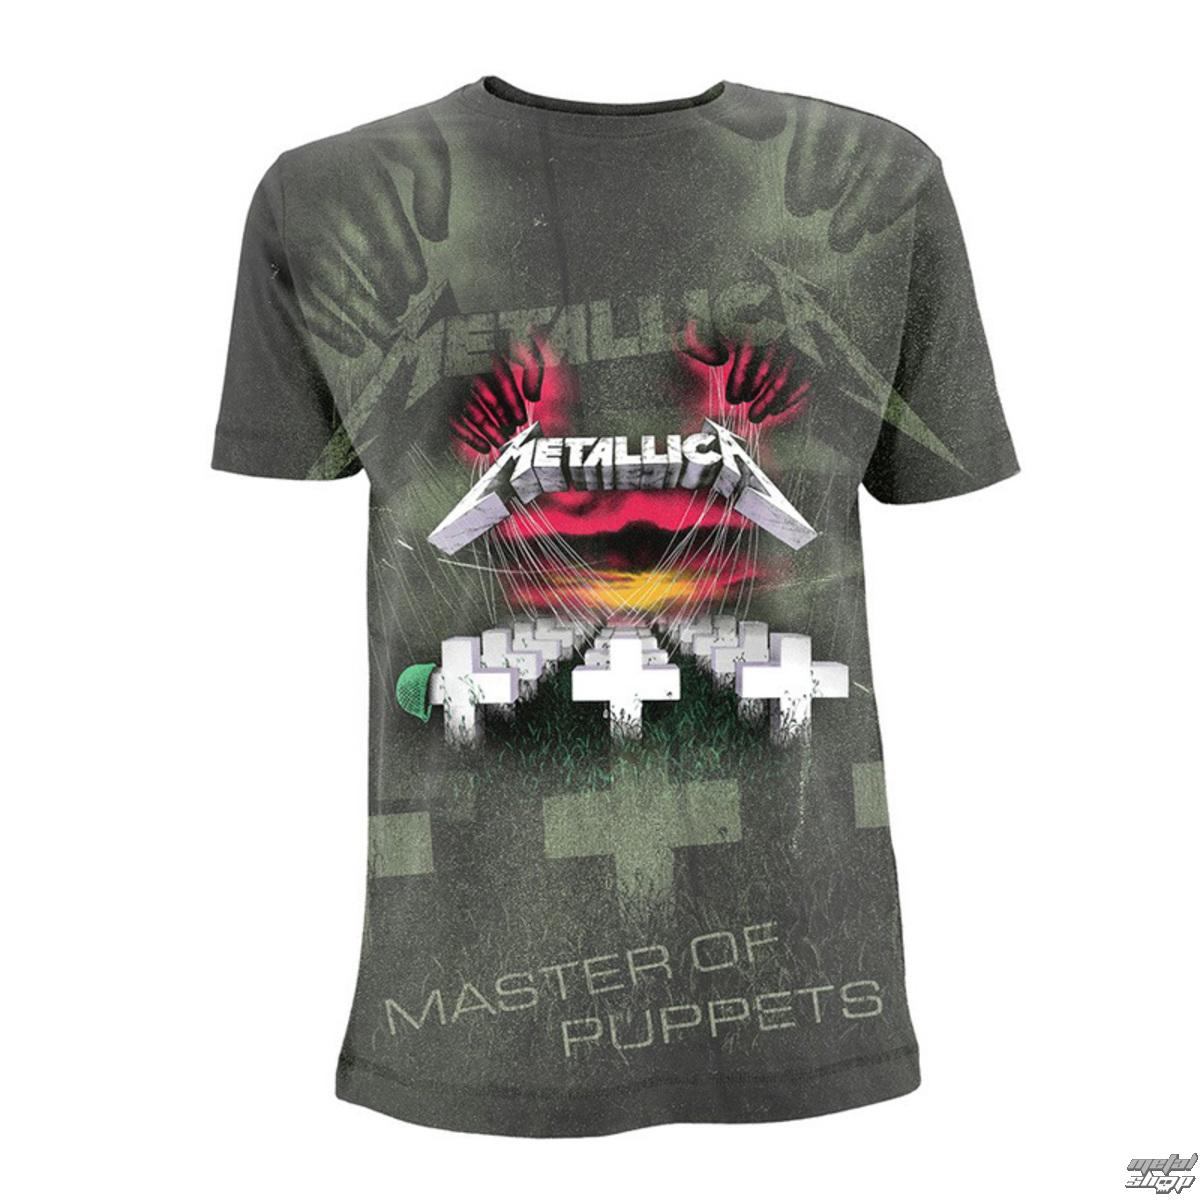 tričko pánske Metallica - Master Of Puppets - Charcoal - RTMTLTSCHMOP